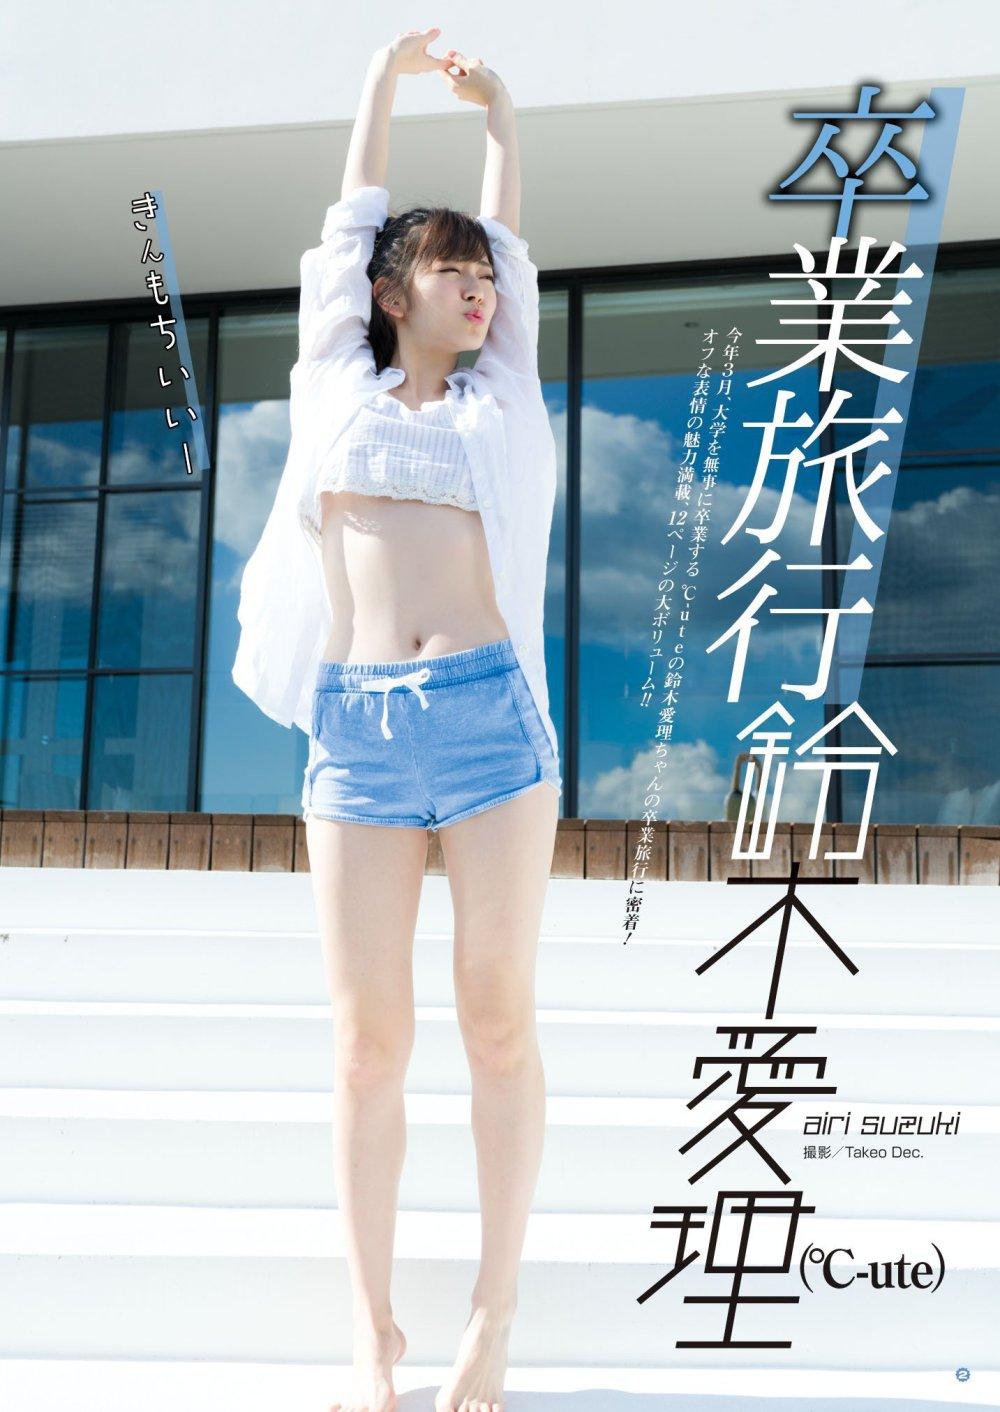 Suzuki Airi en la Young GanGan magazine (adelanto)